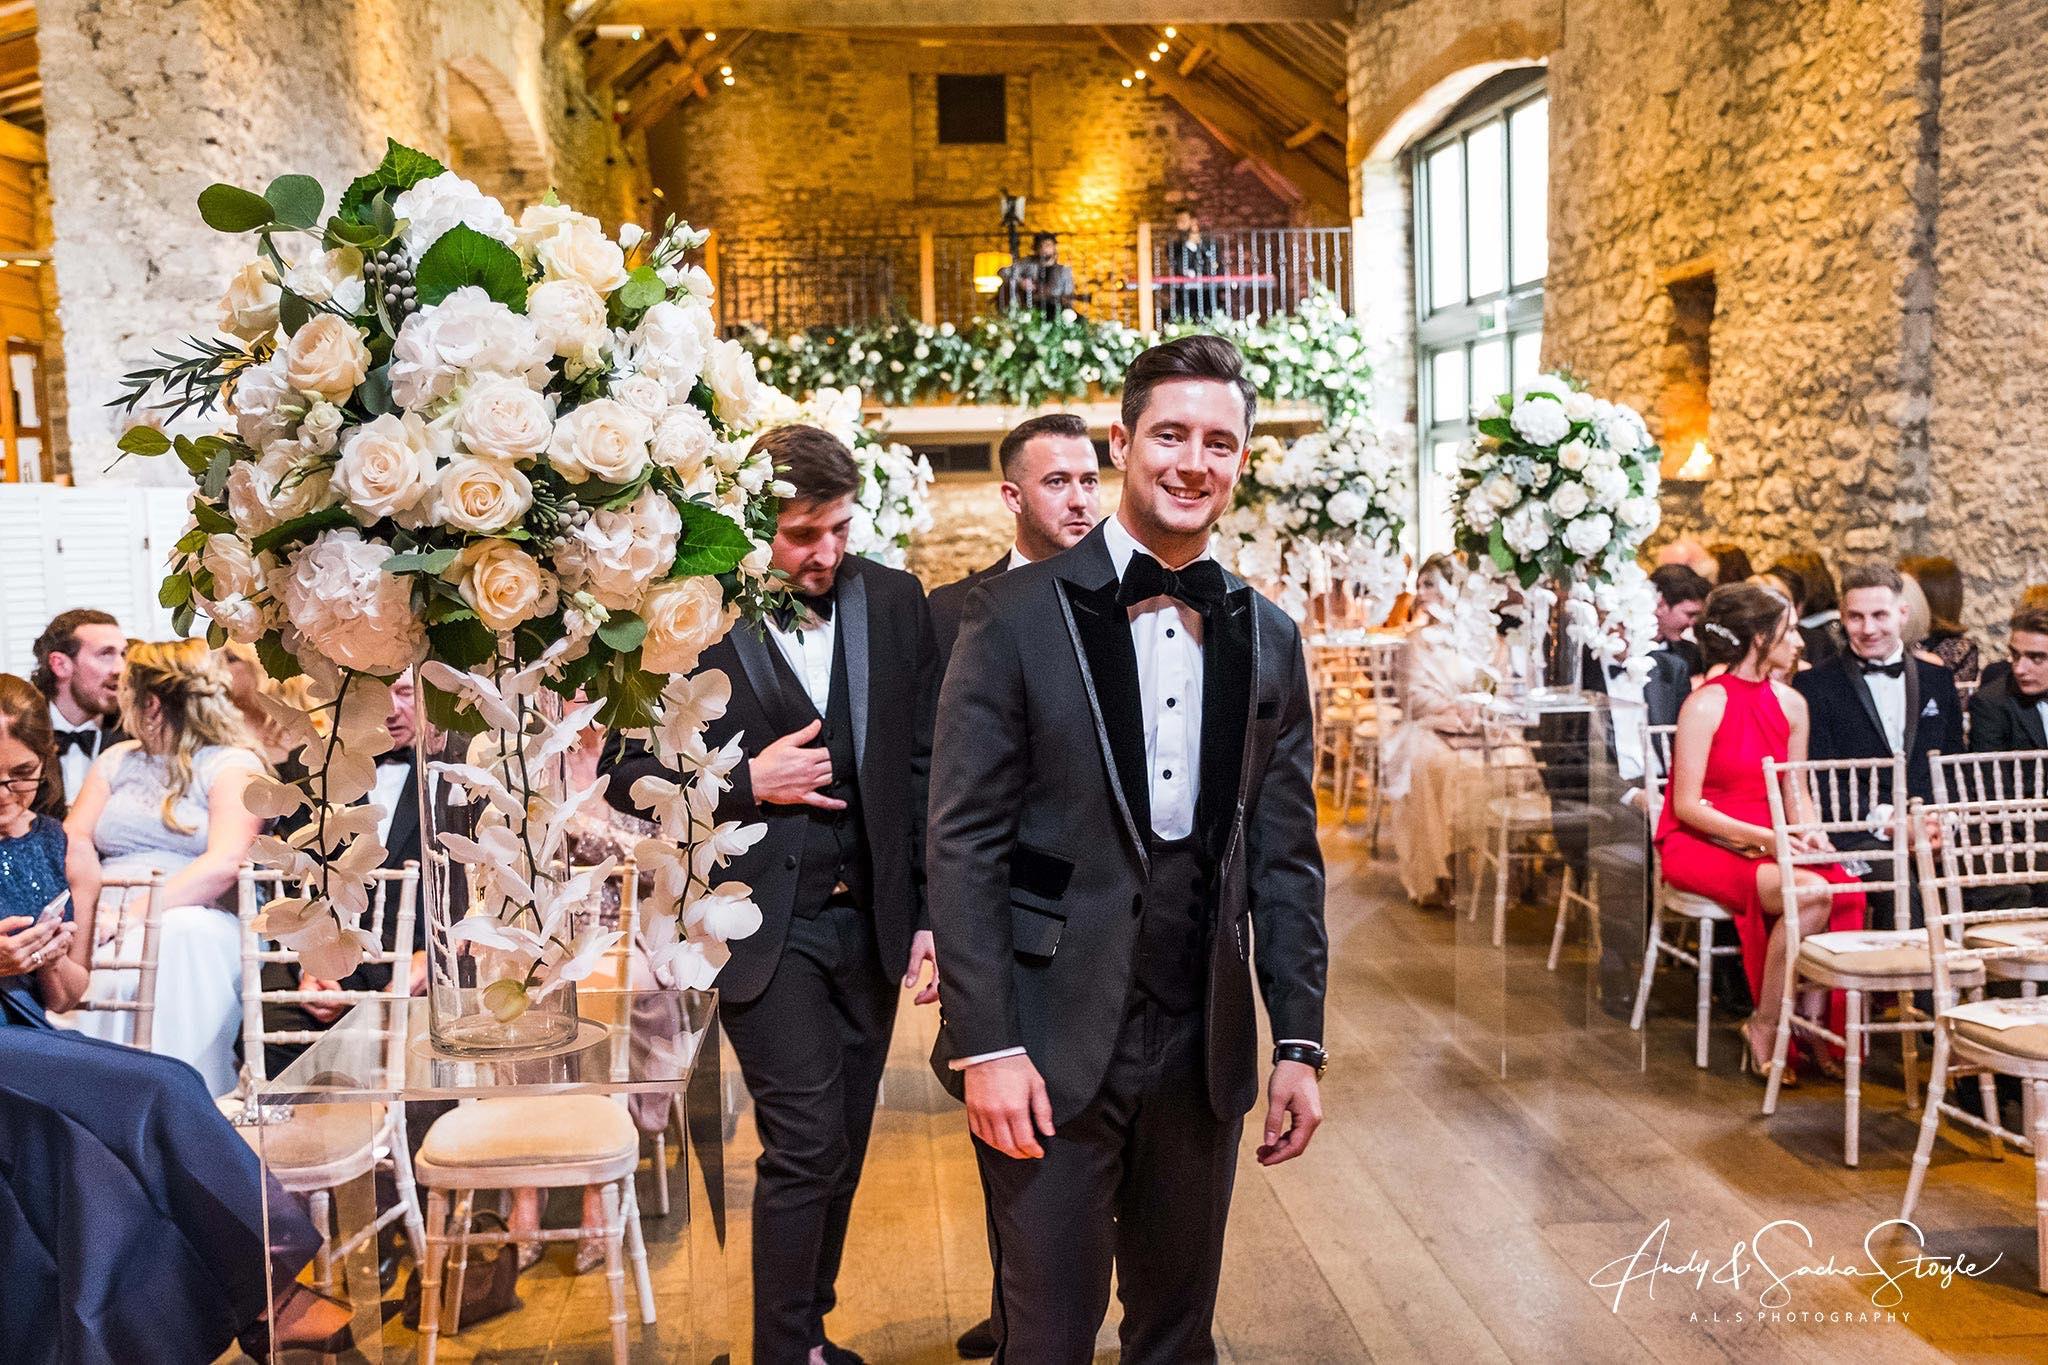 Wedding Flowers - Flowers of Bath - Tythe Barn - Priston Mill - ALS Photography